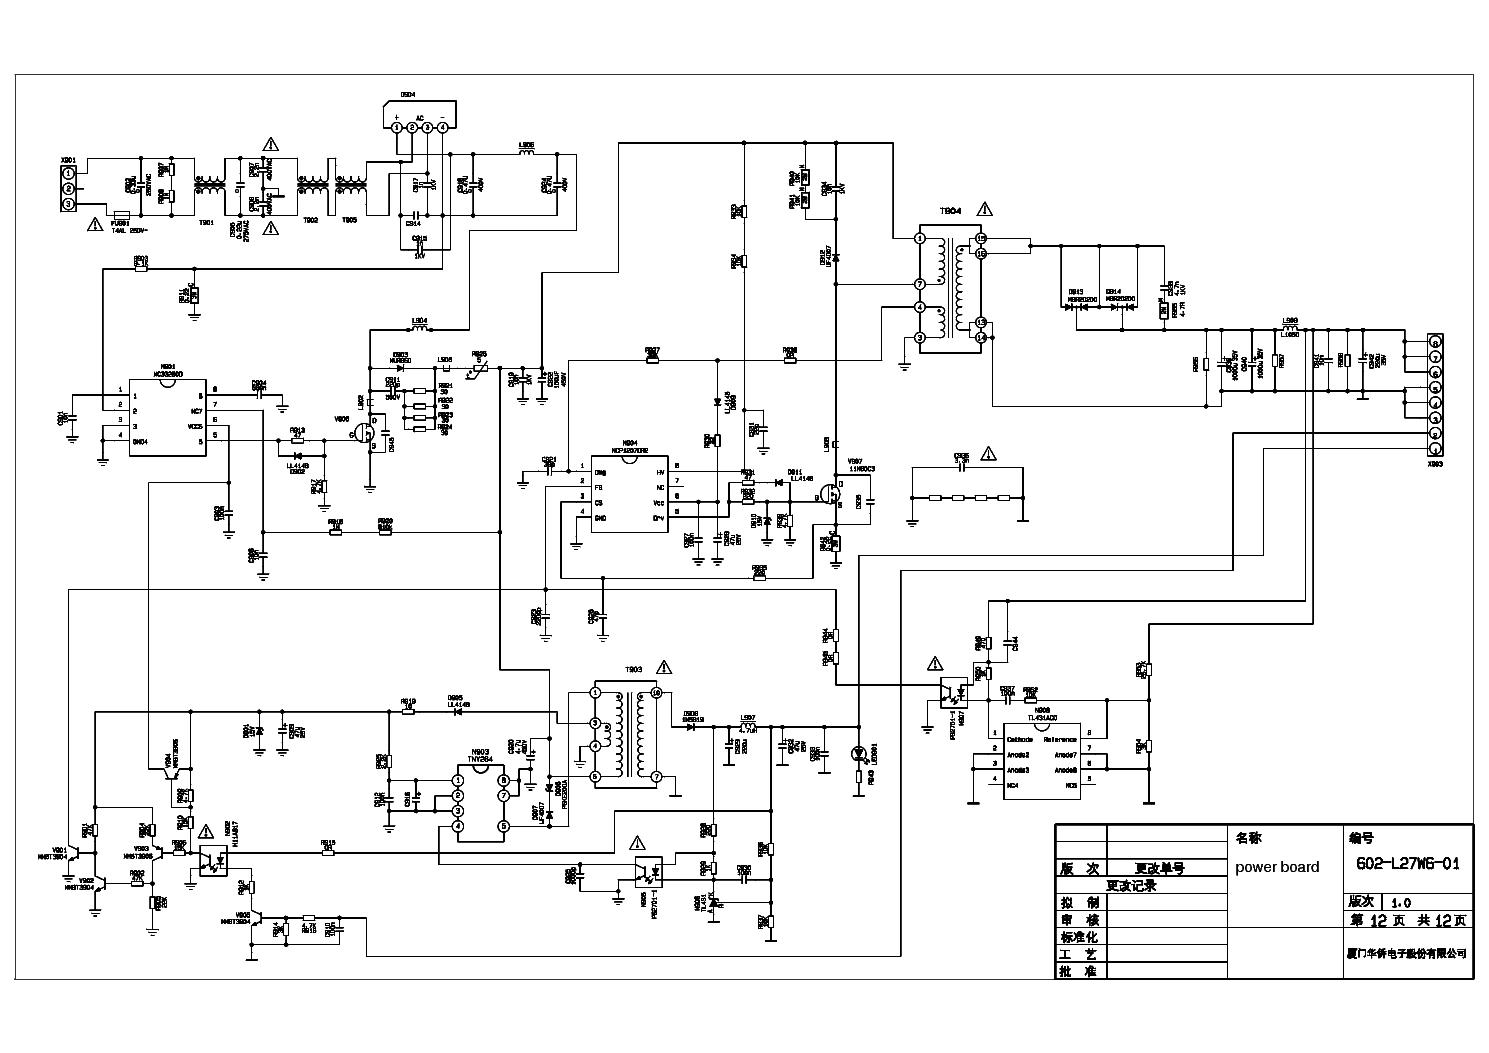 17pw25 4 Circuit Diagram